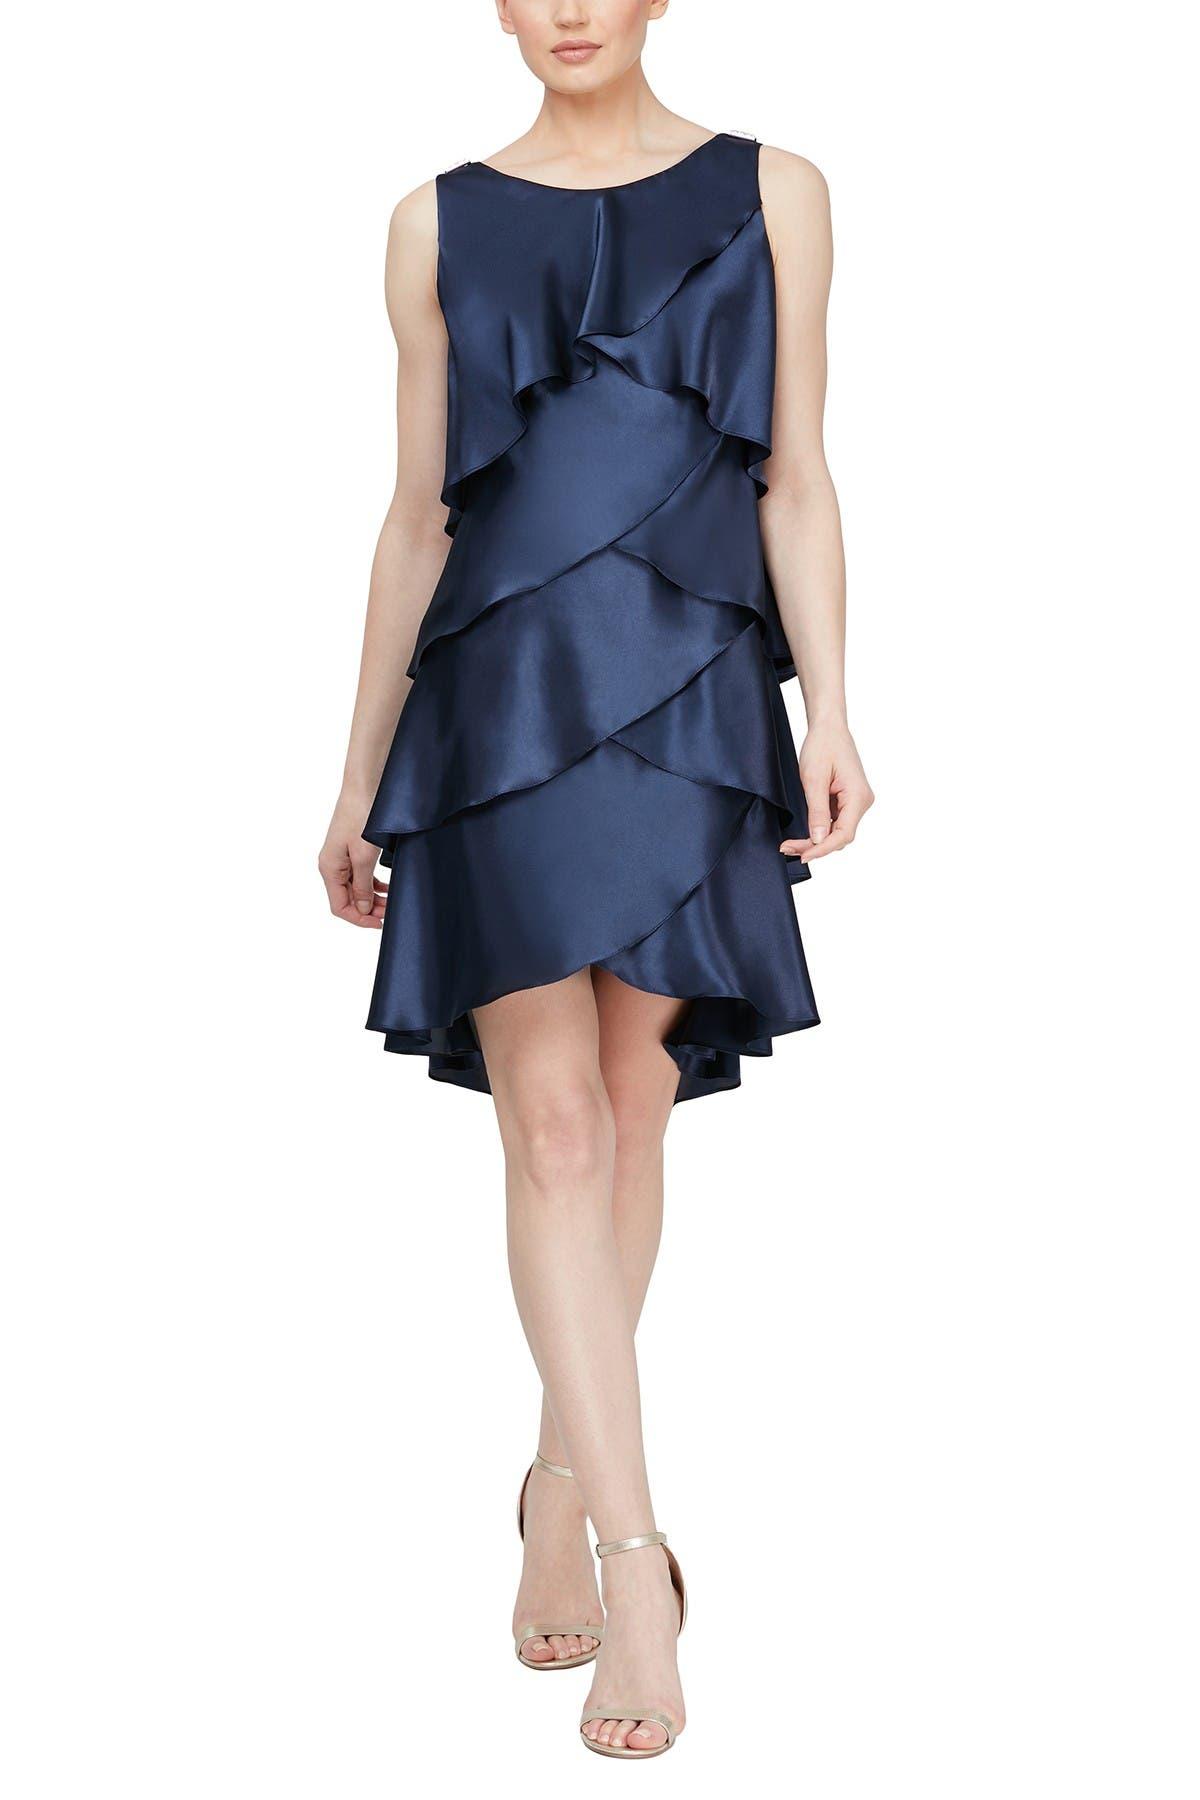 Image of SLNY Satin Tiered Petal Shift Dress